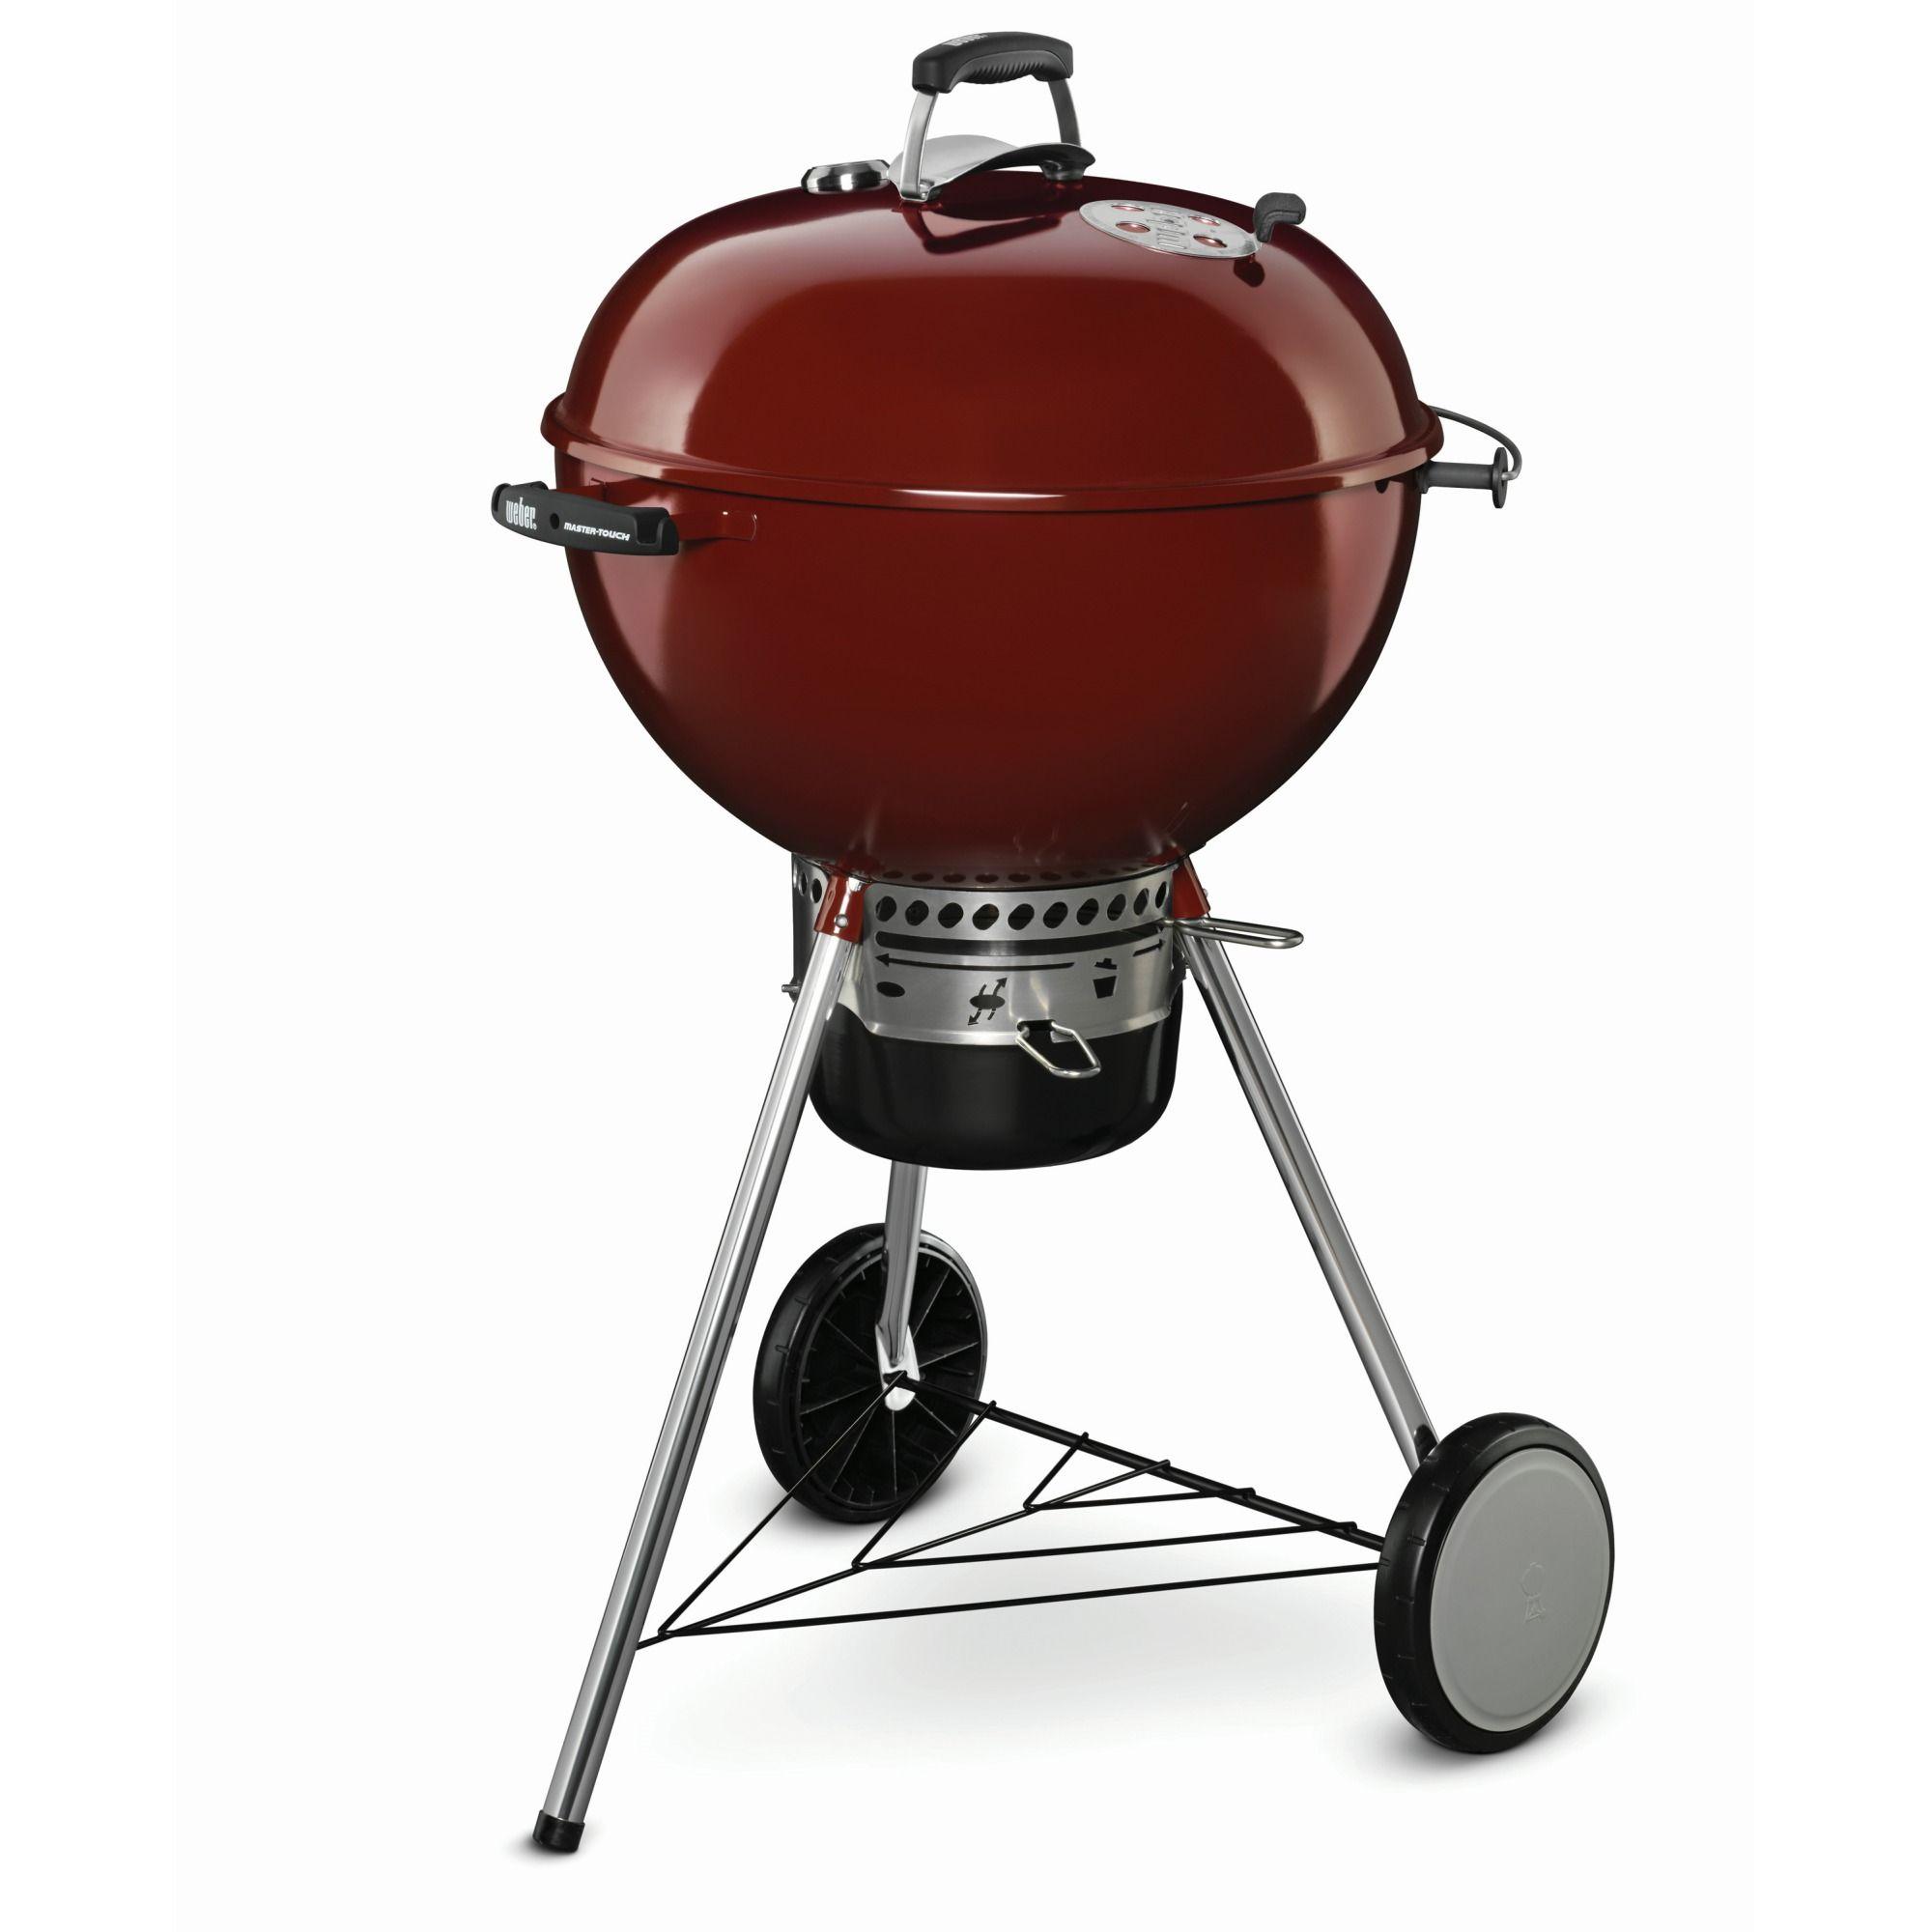 Weber Barbecue Master Touch Premium Gbs Crimson Red 57 Cm Kopen Karwei Houtskoolgrill Bbq Buitenkeukens